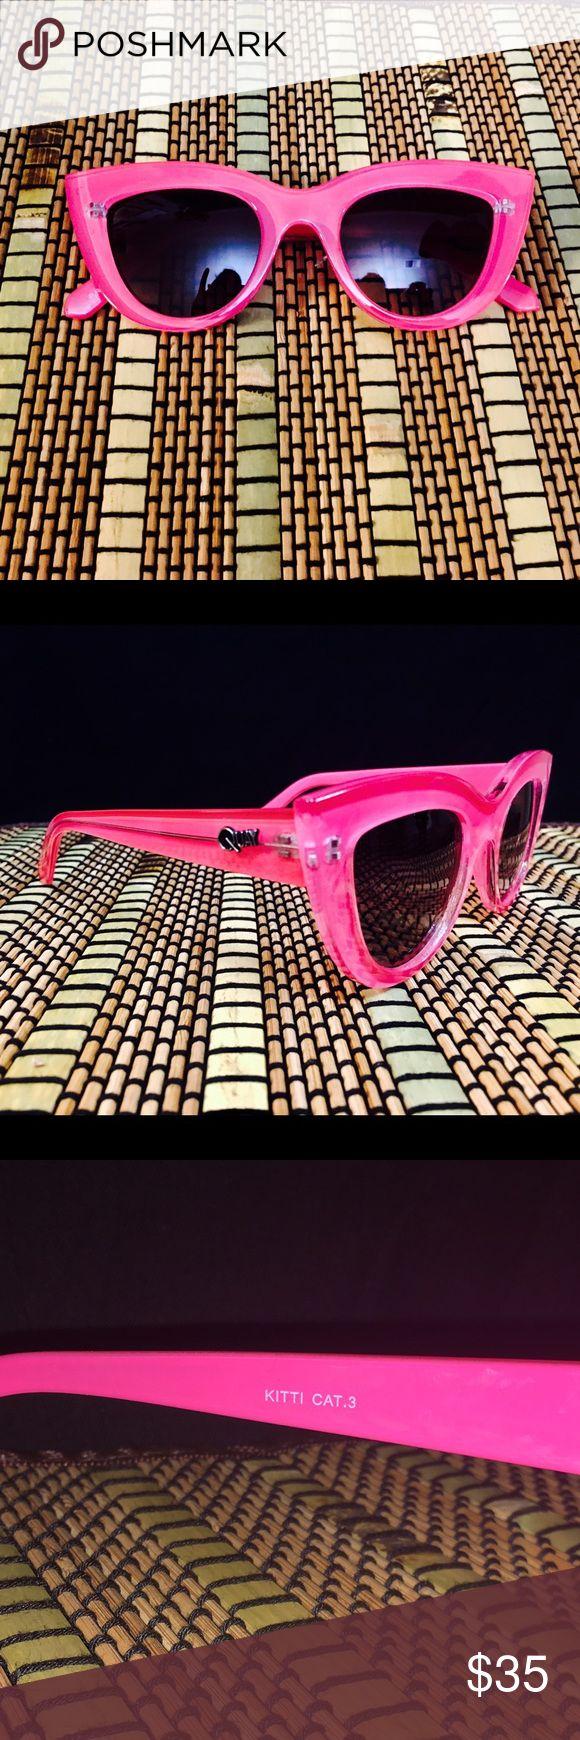 Quay Kitti Cat Sunnies Perfect Condition 🦄 💯% Authentic Quay Kitti Cat Sunglasses 😎 No scratches, perfect lenses, and overall perfect condition. These beauties will come with a Quay case, which is also in perfect condition! Quay Australia Accessories Sunglasses